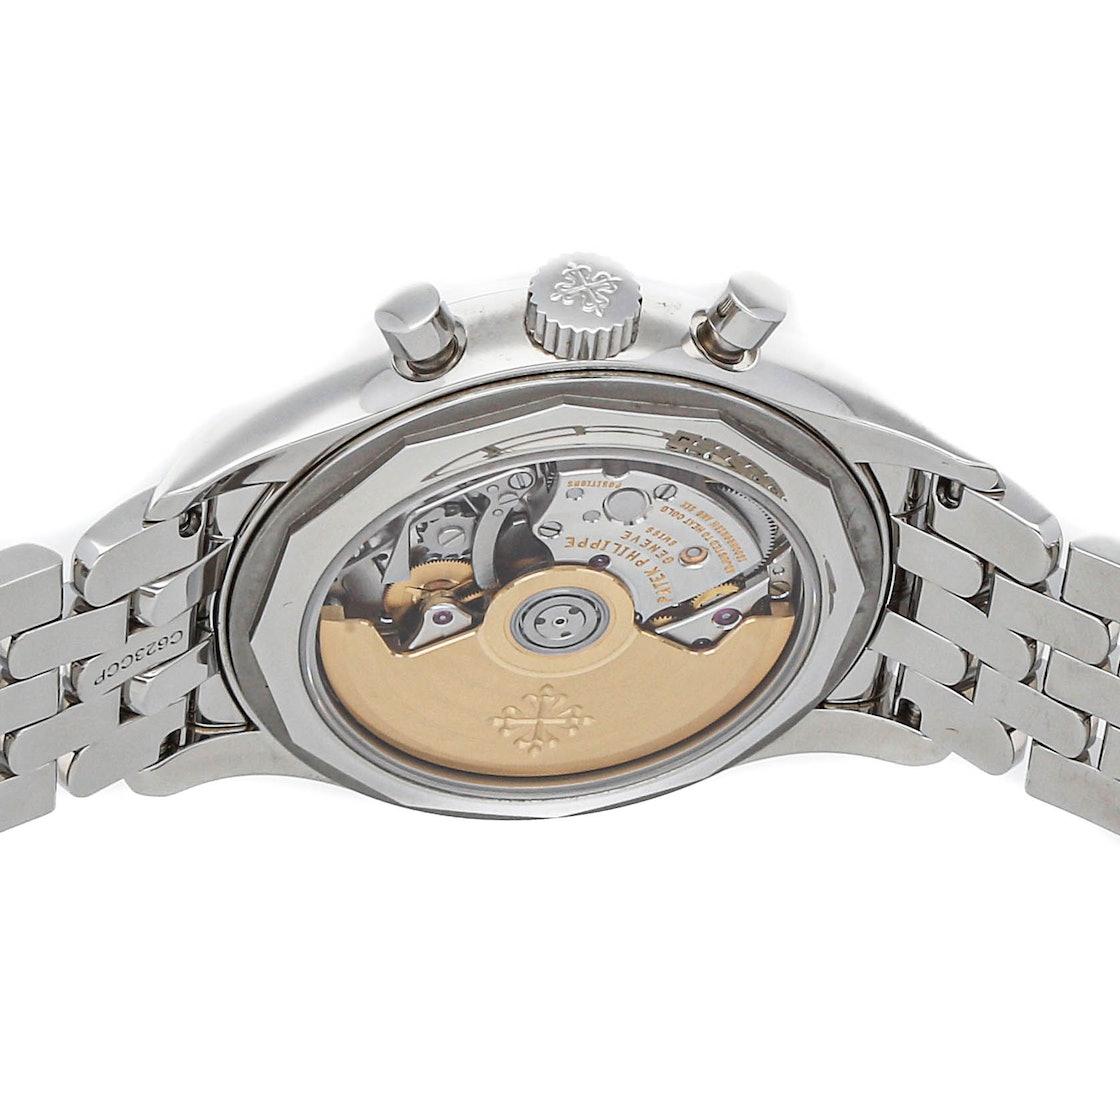 Patek Philippe Complications Annual Calendar Chronograph 5960/1A-001